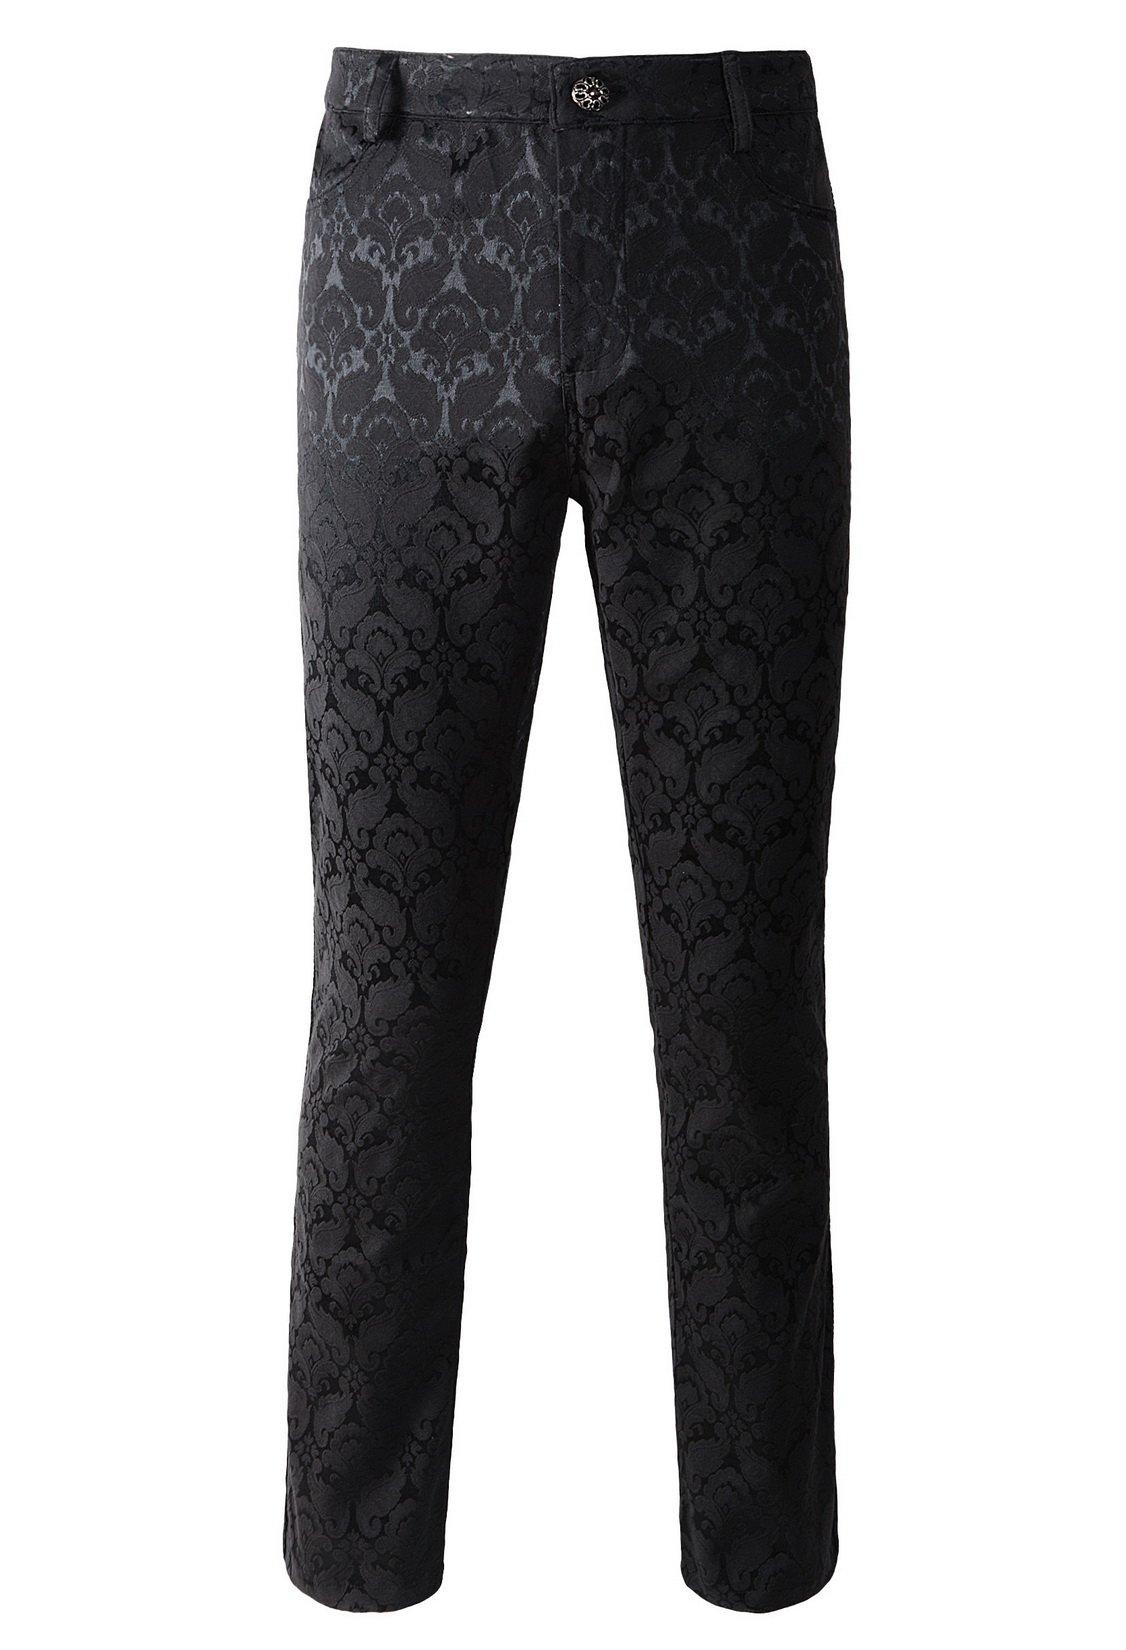 DarcChic Mens Trousers Pants Brocade VTG Gothic Aristocrat Steampunk Side Braiding Trim 3